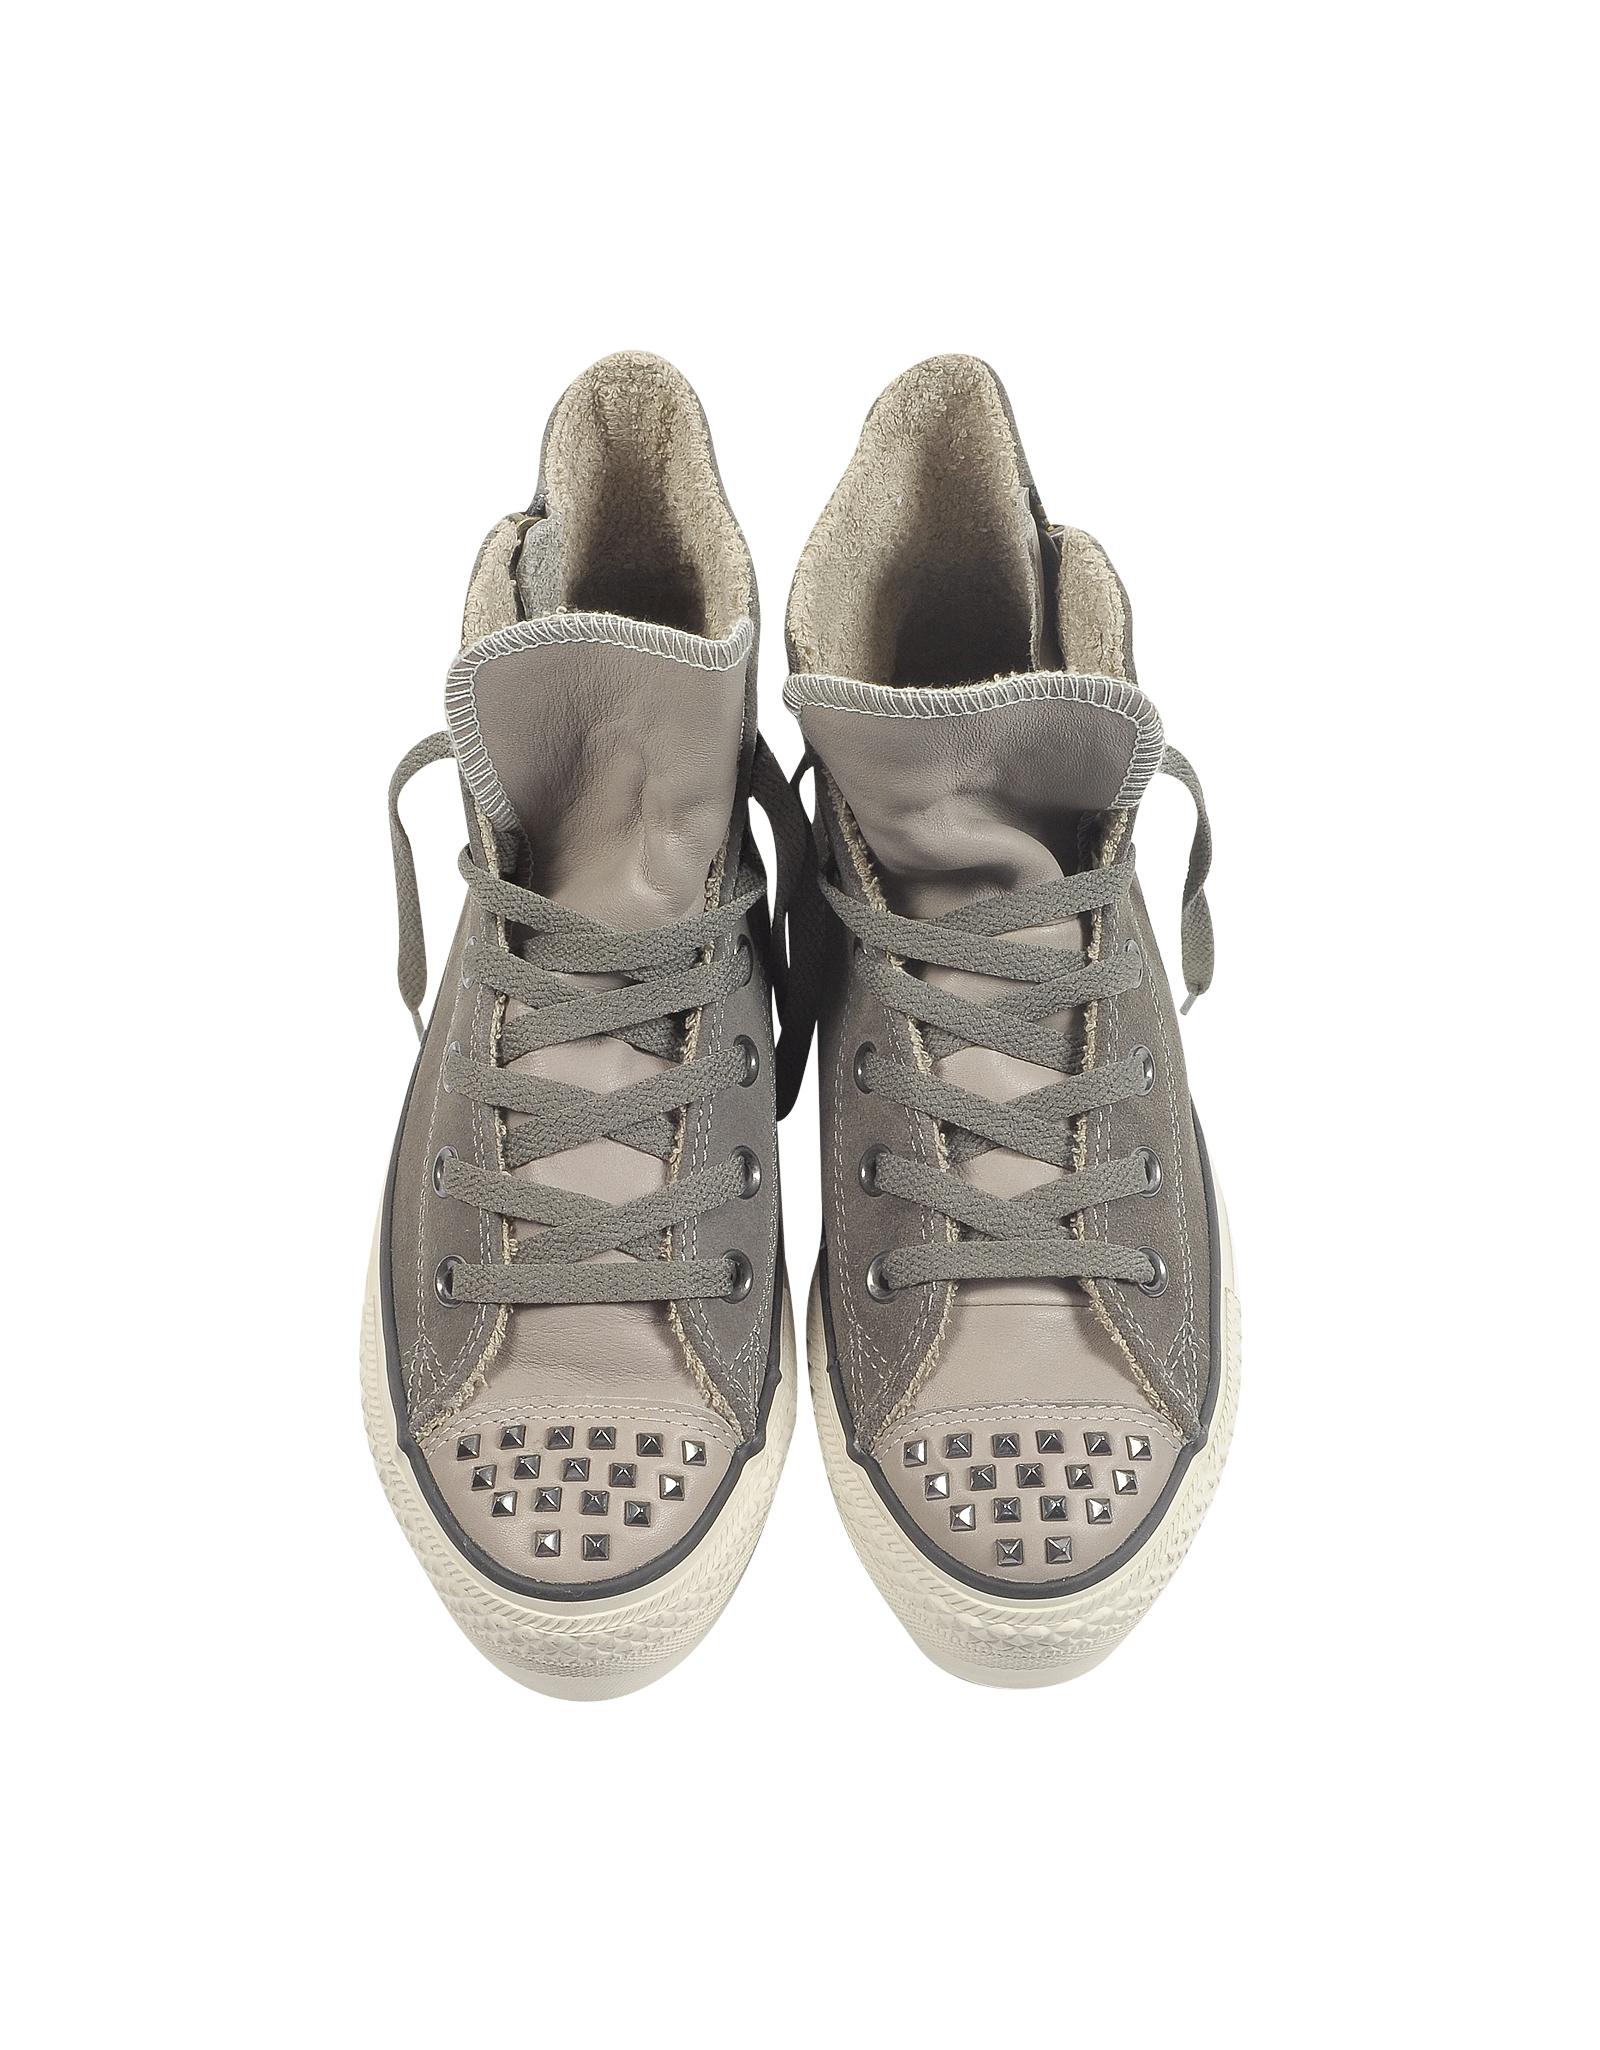 6197b1e274f4bd Gallery. Women s Converse Platform Women s Adidas Samba Women s Studded  Sneakers ...